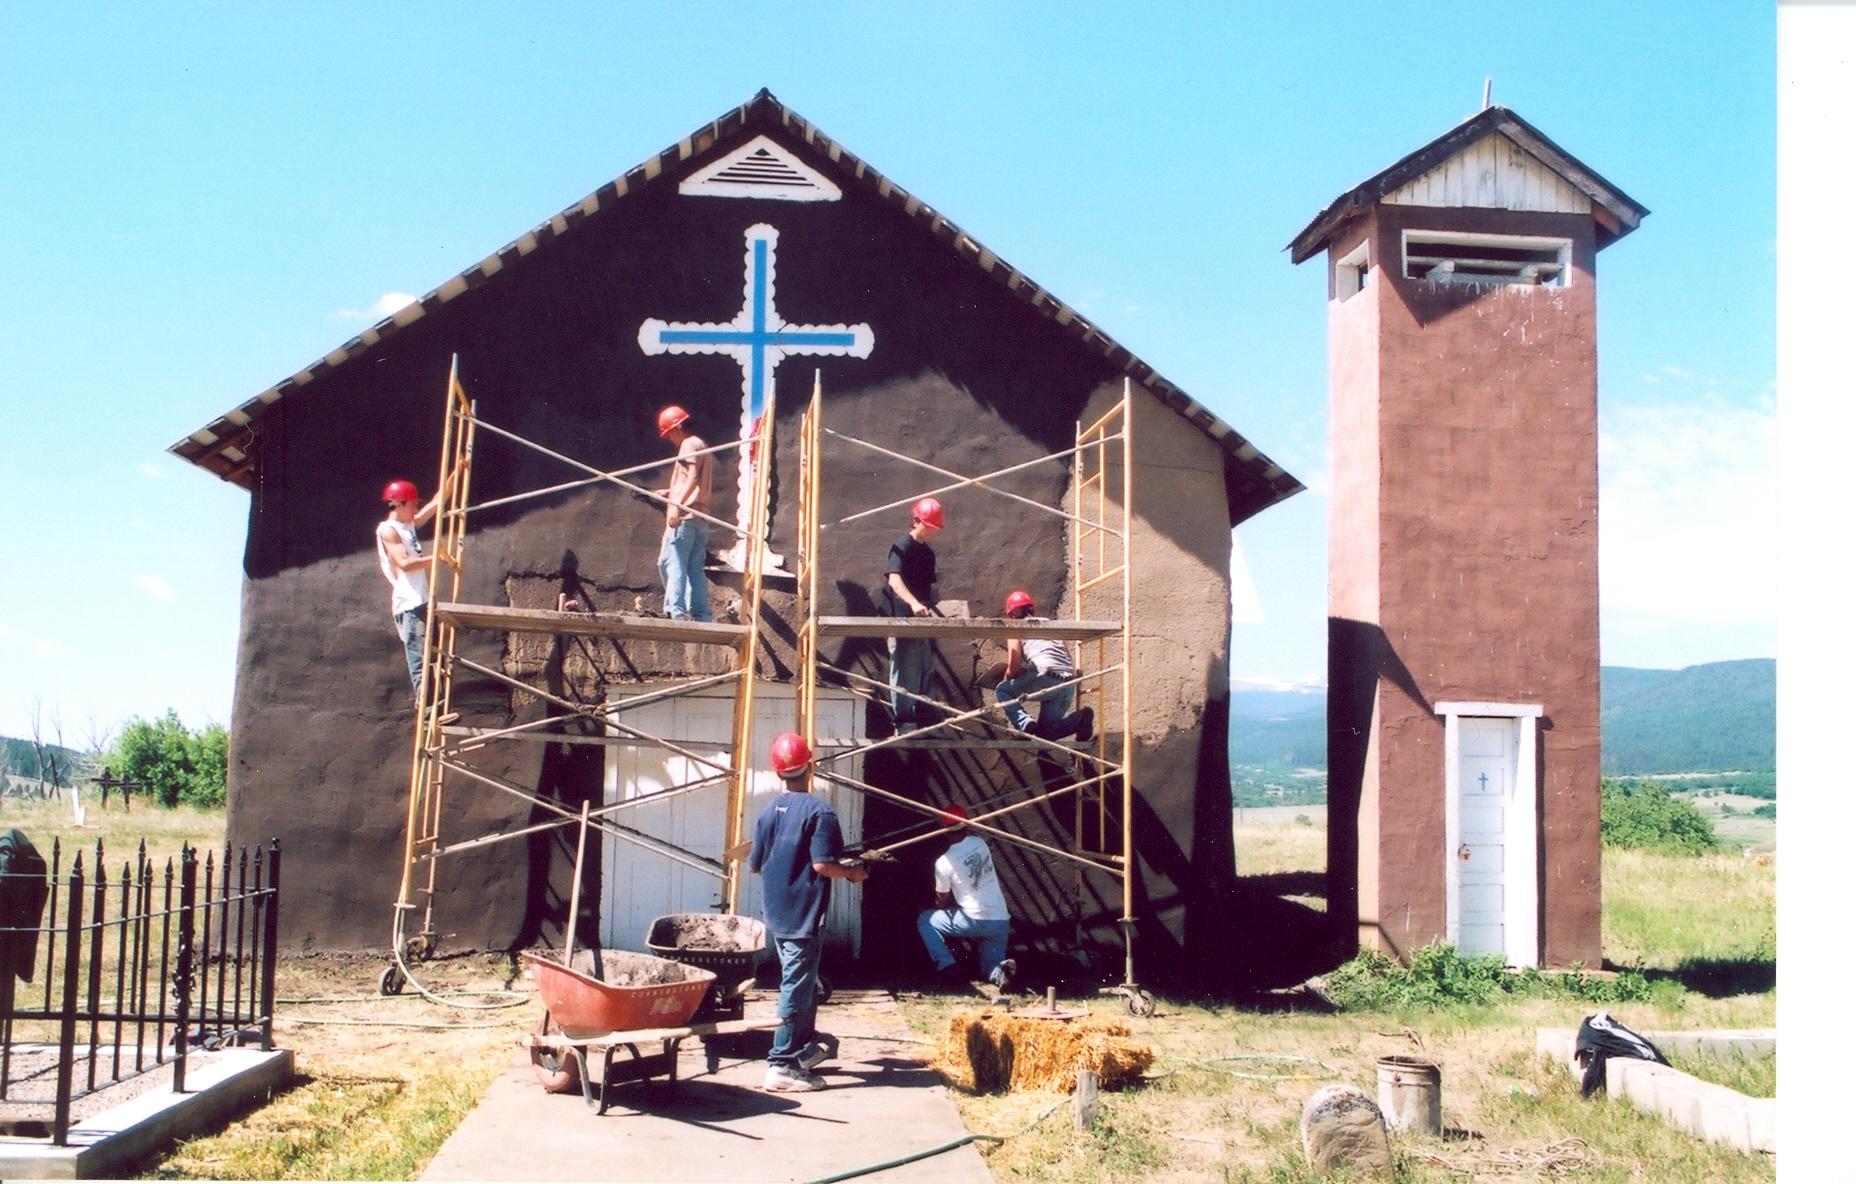 June-Mora-youth-mud-plastering0003.jpg